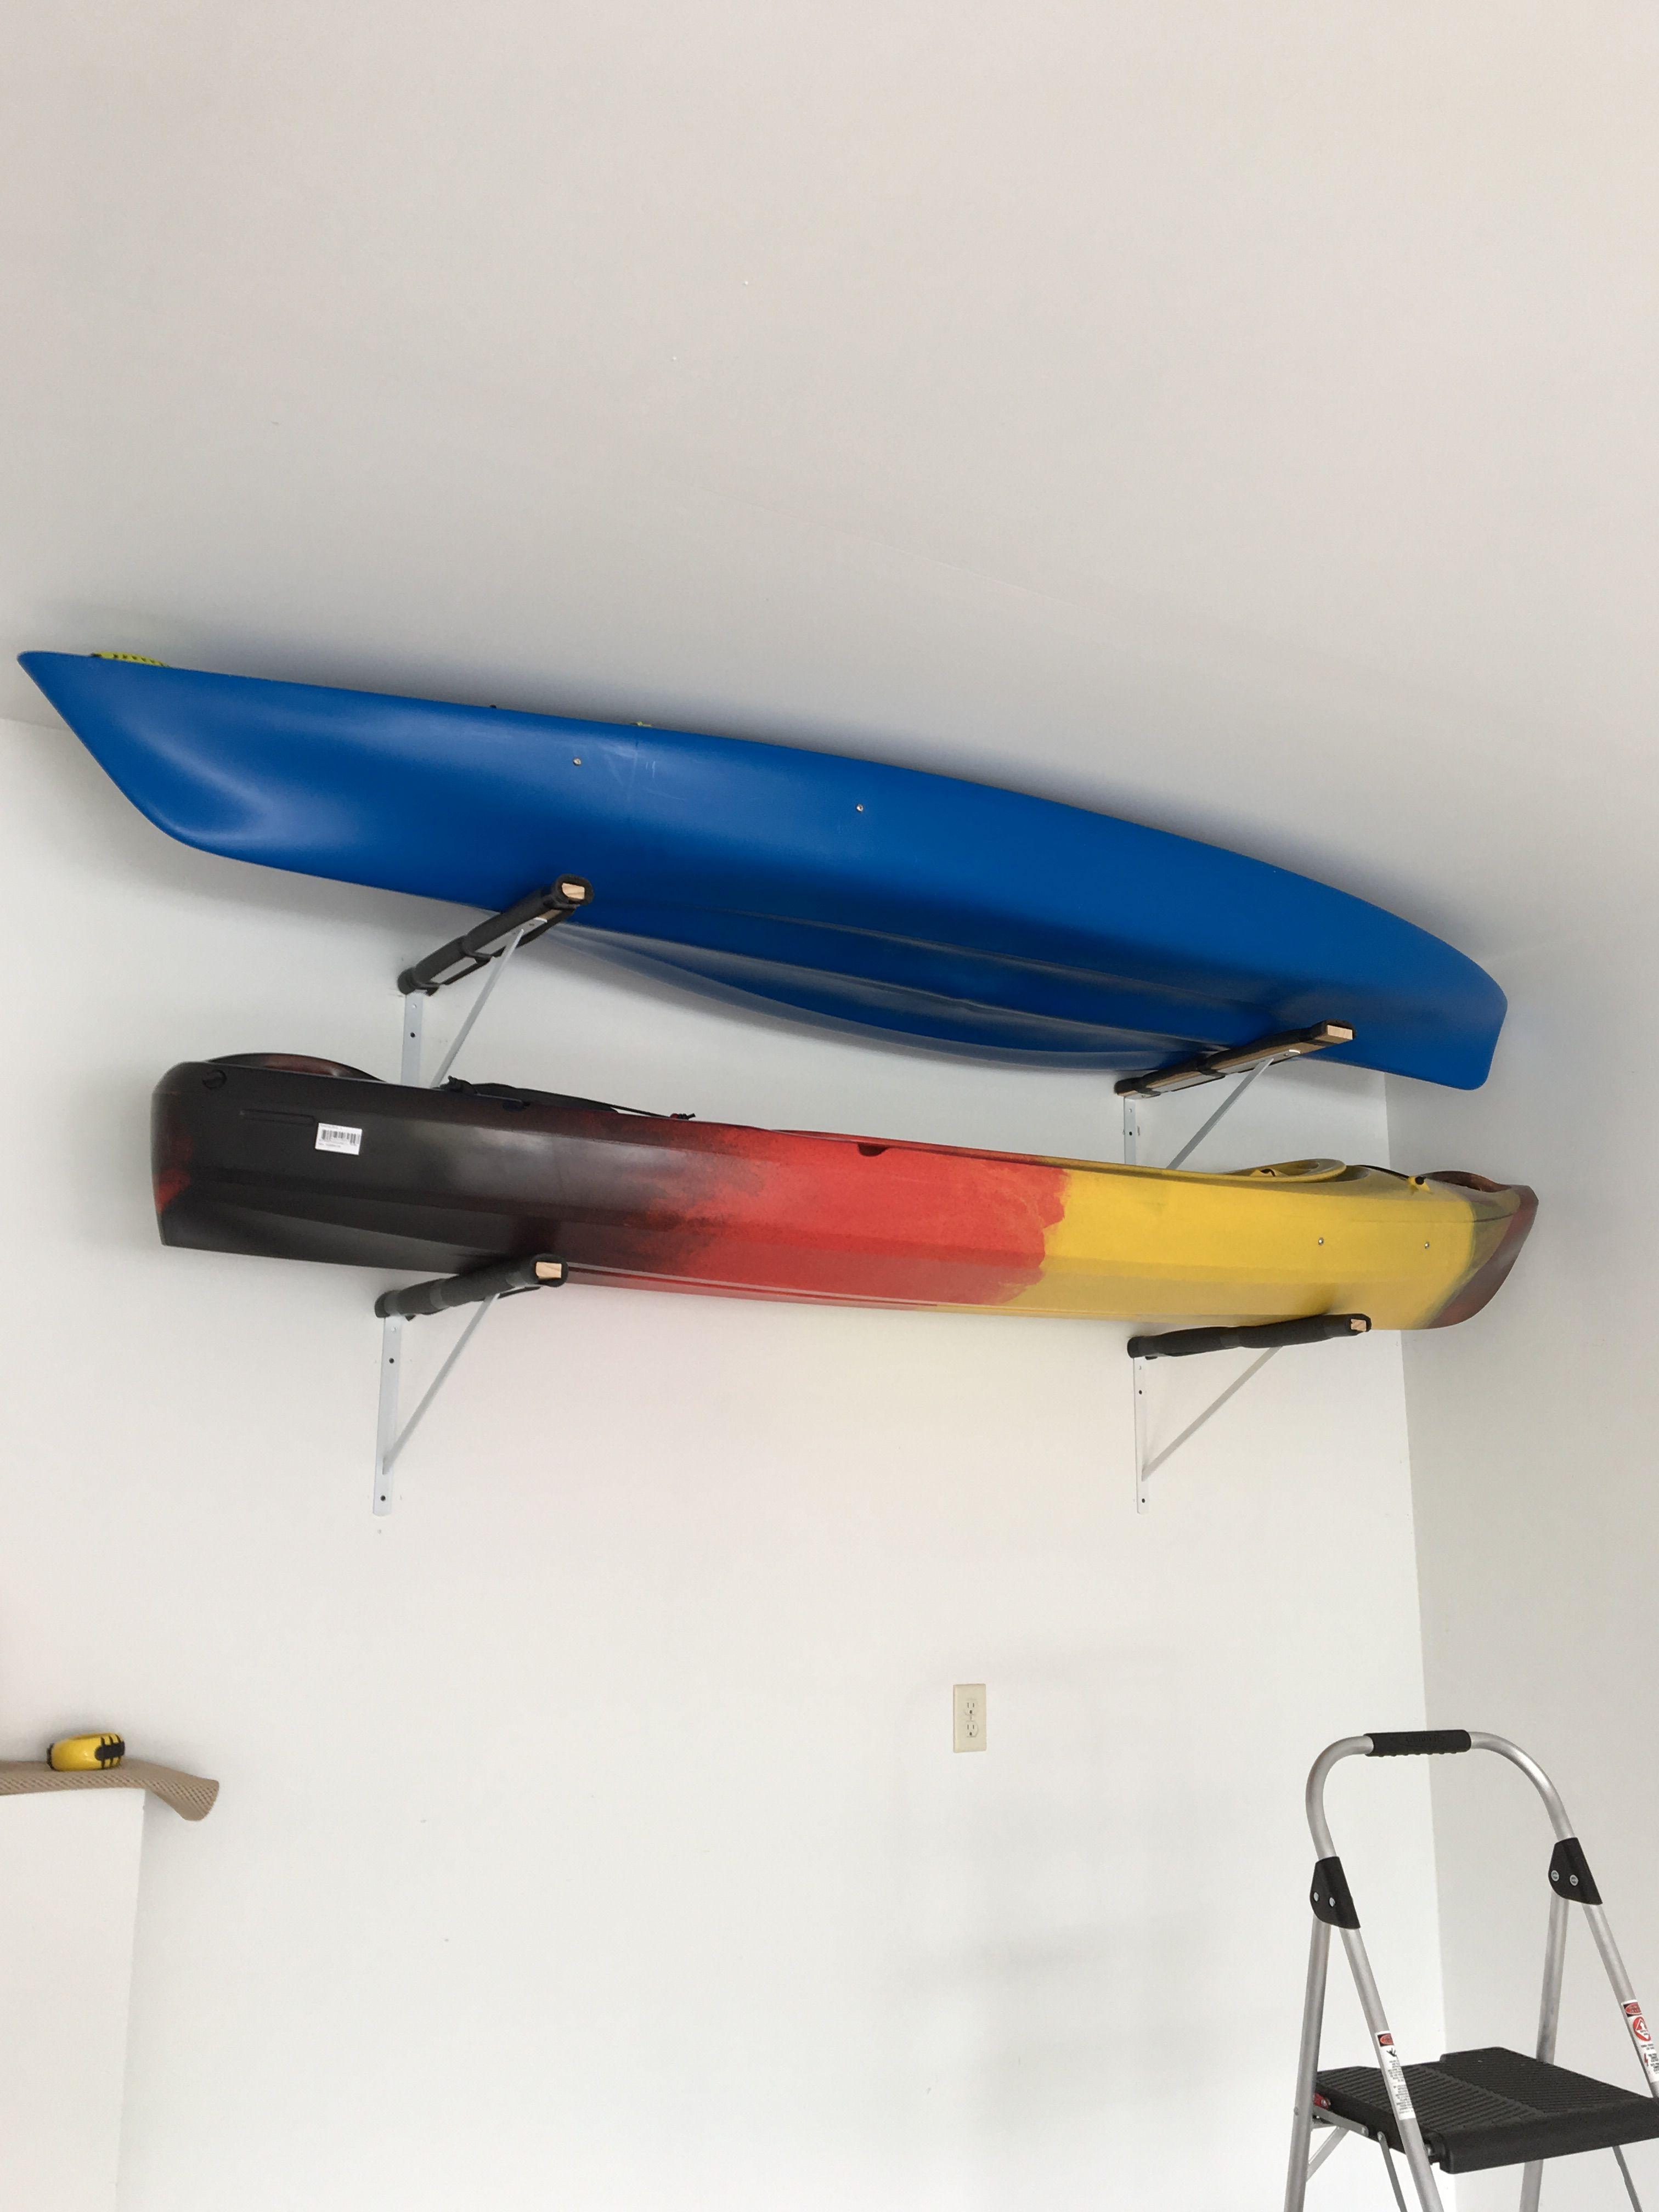 Kayak Storage With Shelf Brackets And Pipe Insulation